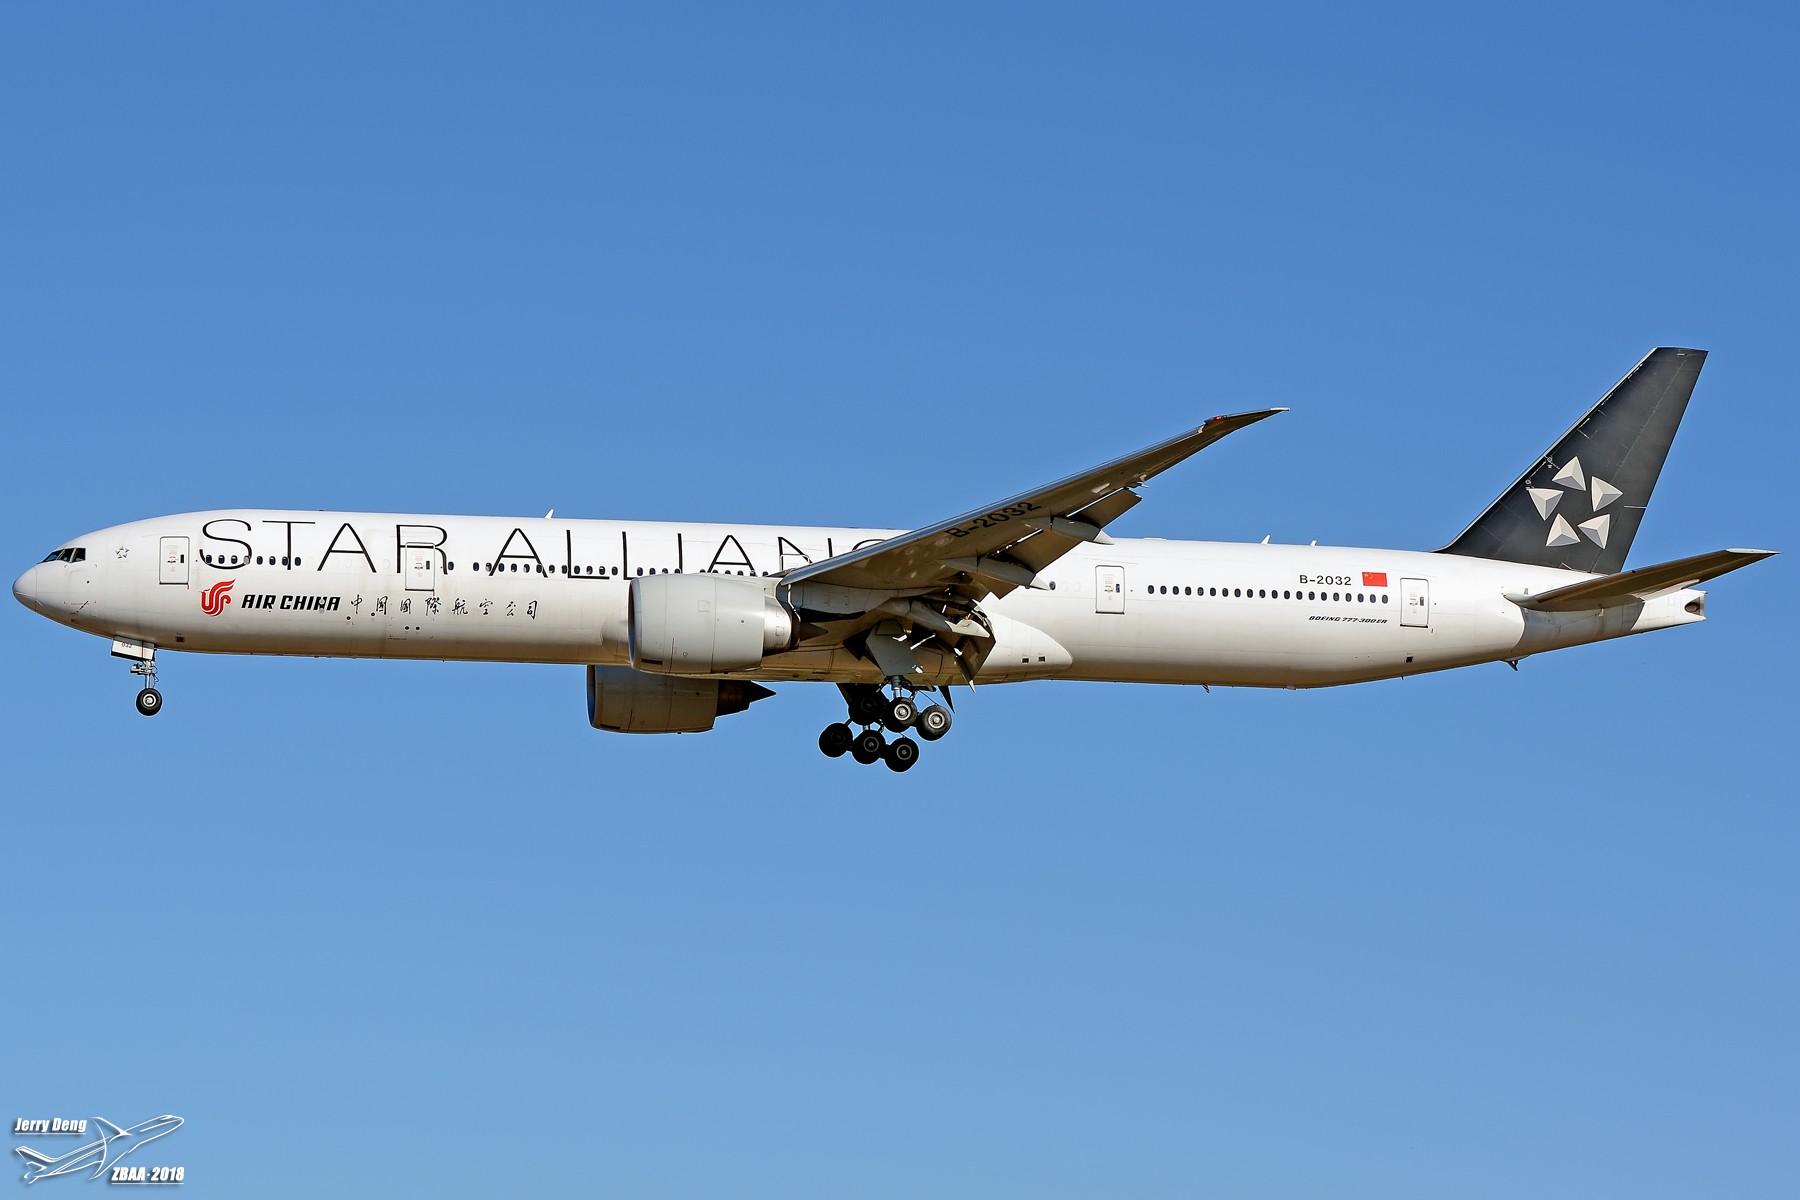 Re:[原创]【多图党】出差赶上天气不错ZBAA随拍 BOEING 777-300ER B-2032 中国北京首都国际机场